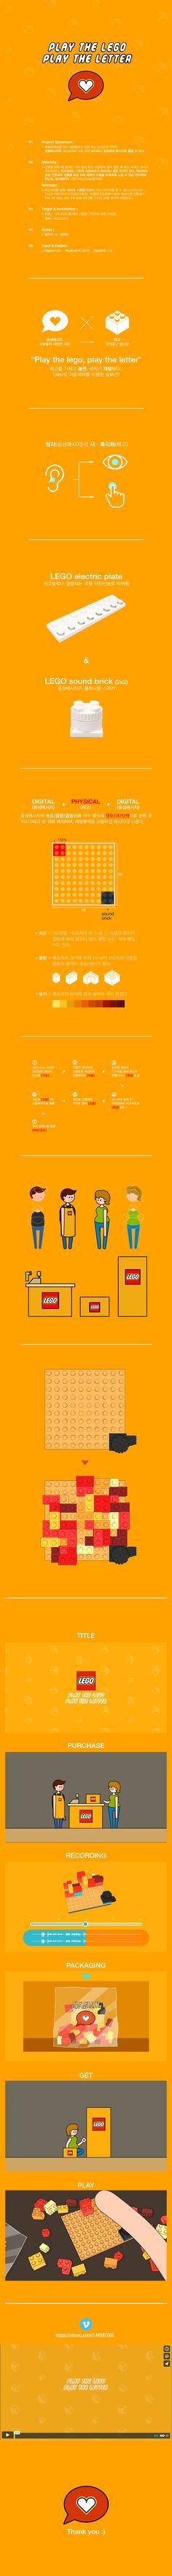 Kim Sungmin│ Information Visualization 2015│ Major in Digital Media Design │#hicoda │hicoda.hongik.ac.kr